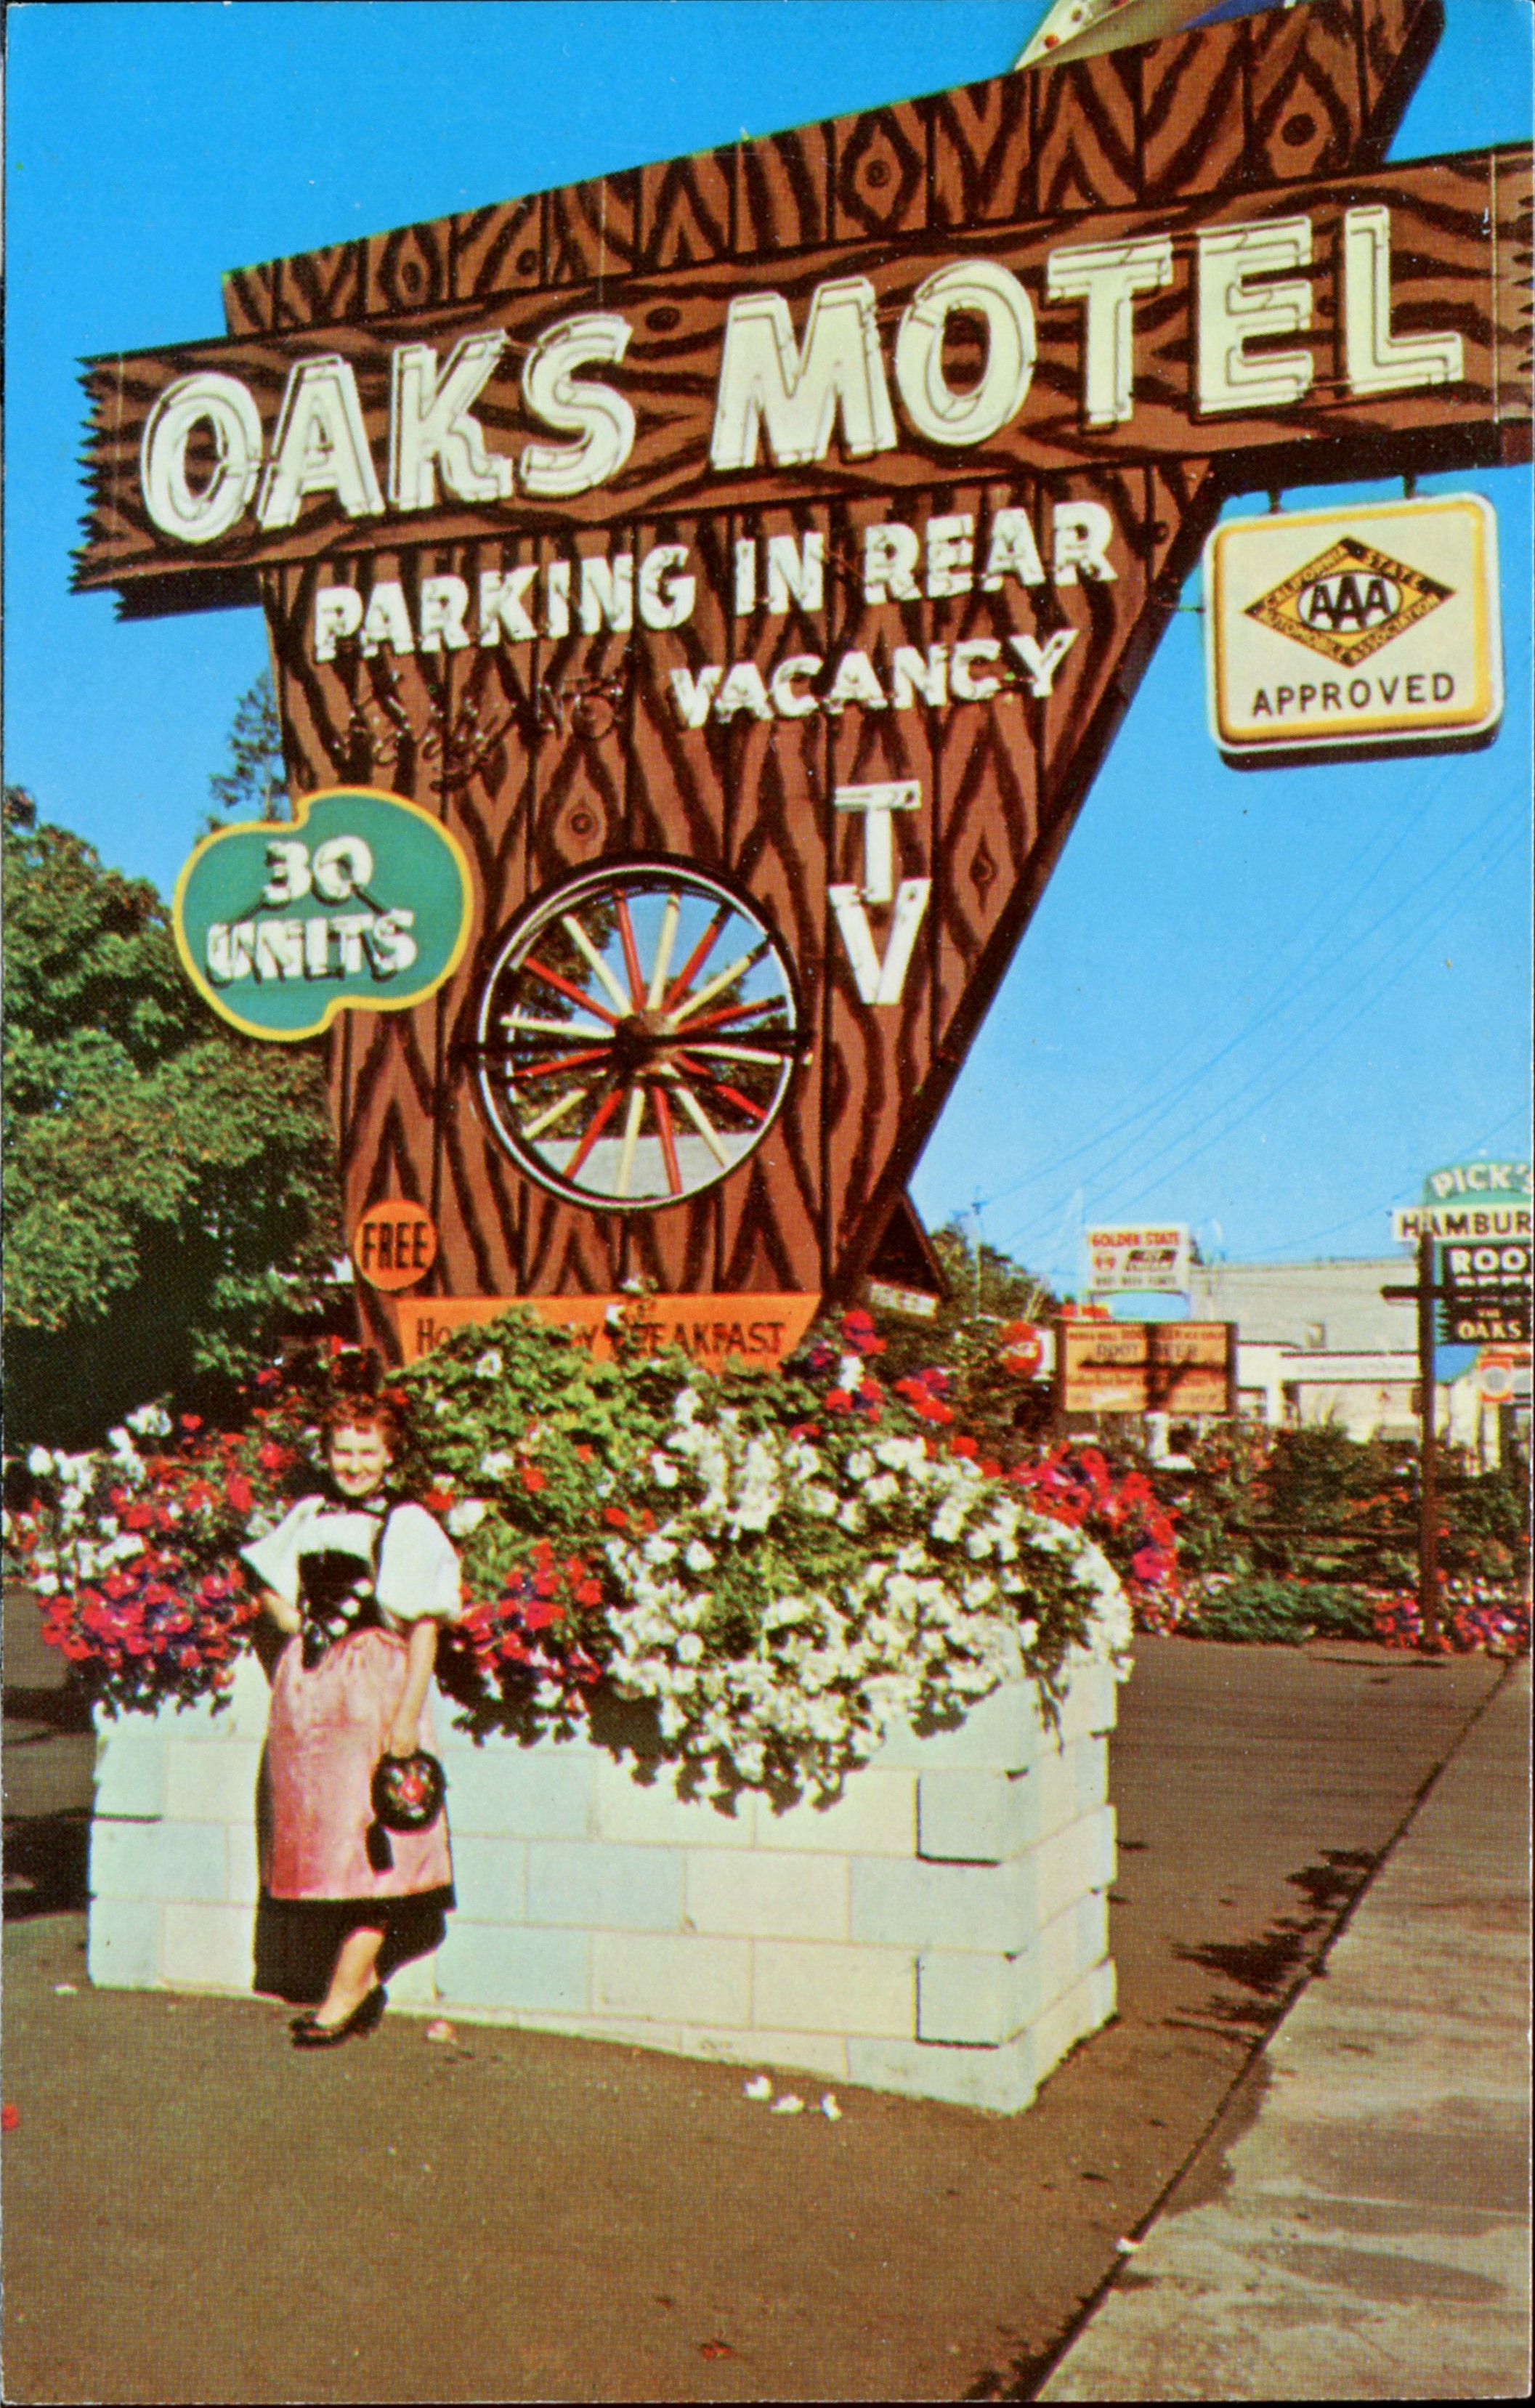 Oaks Motel - 123 South Cloverdale Boulevard, Cloverdale, California U.S.A. - date unknown